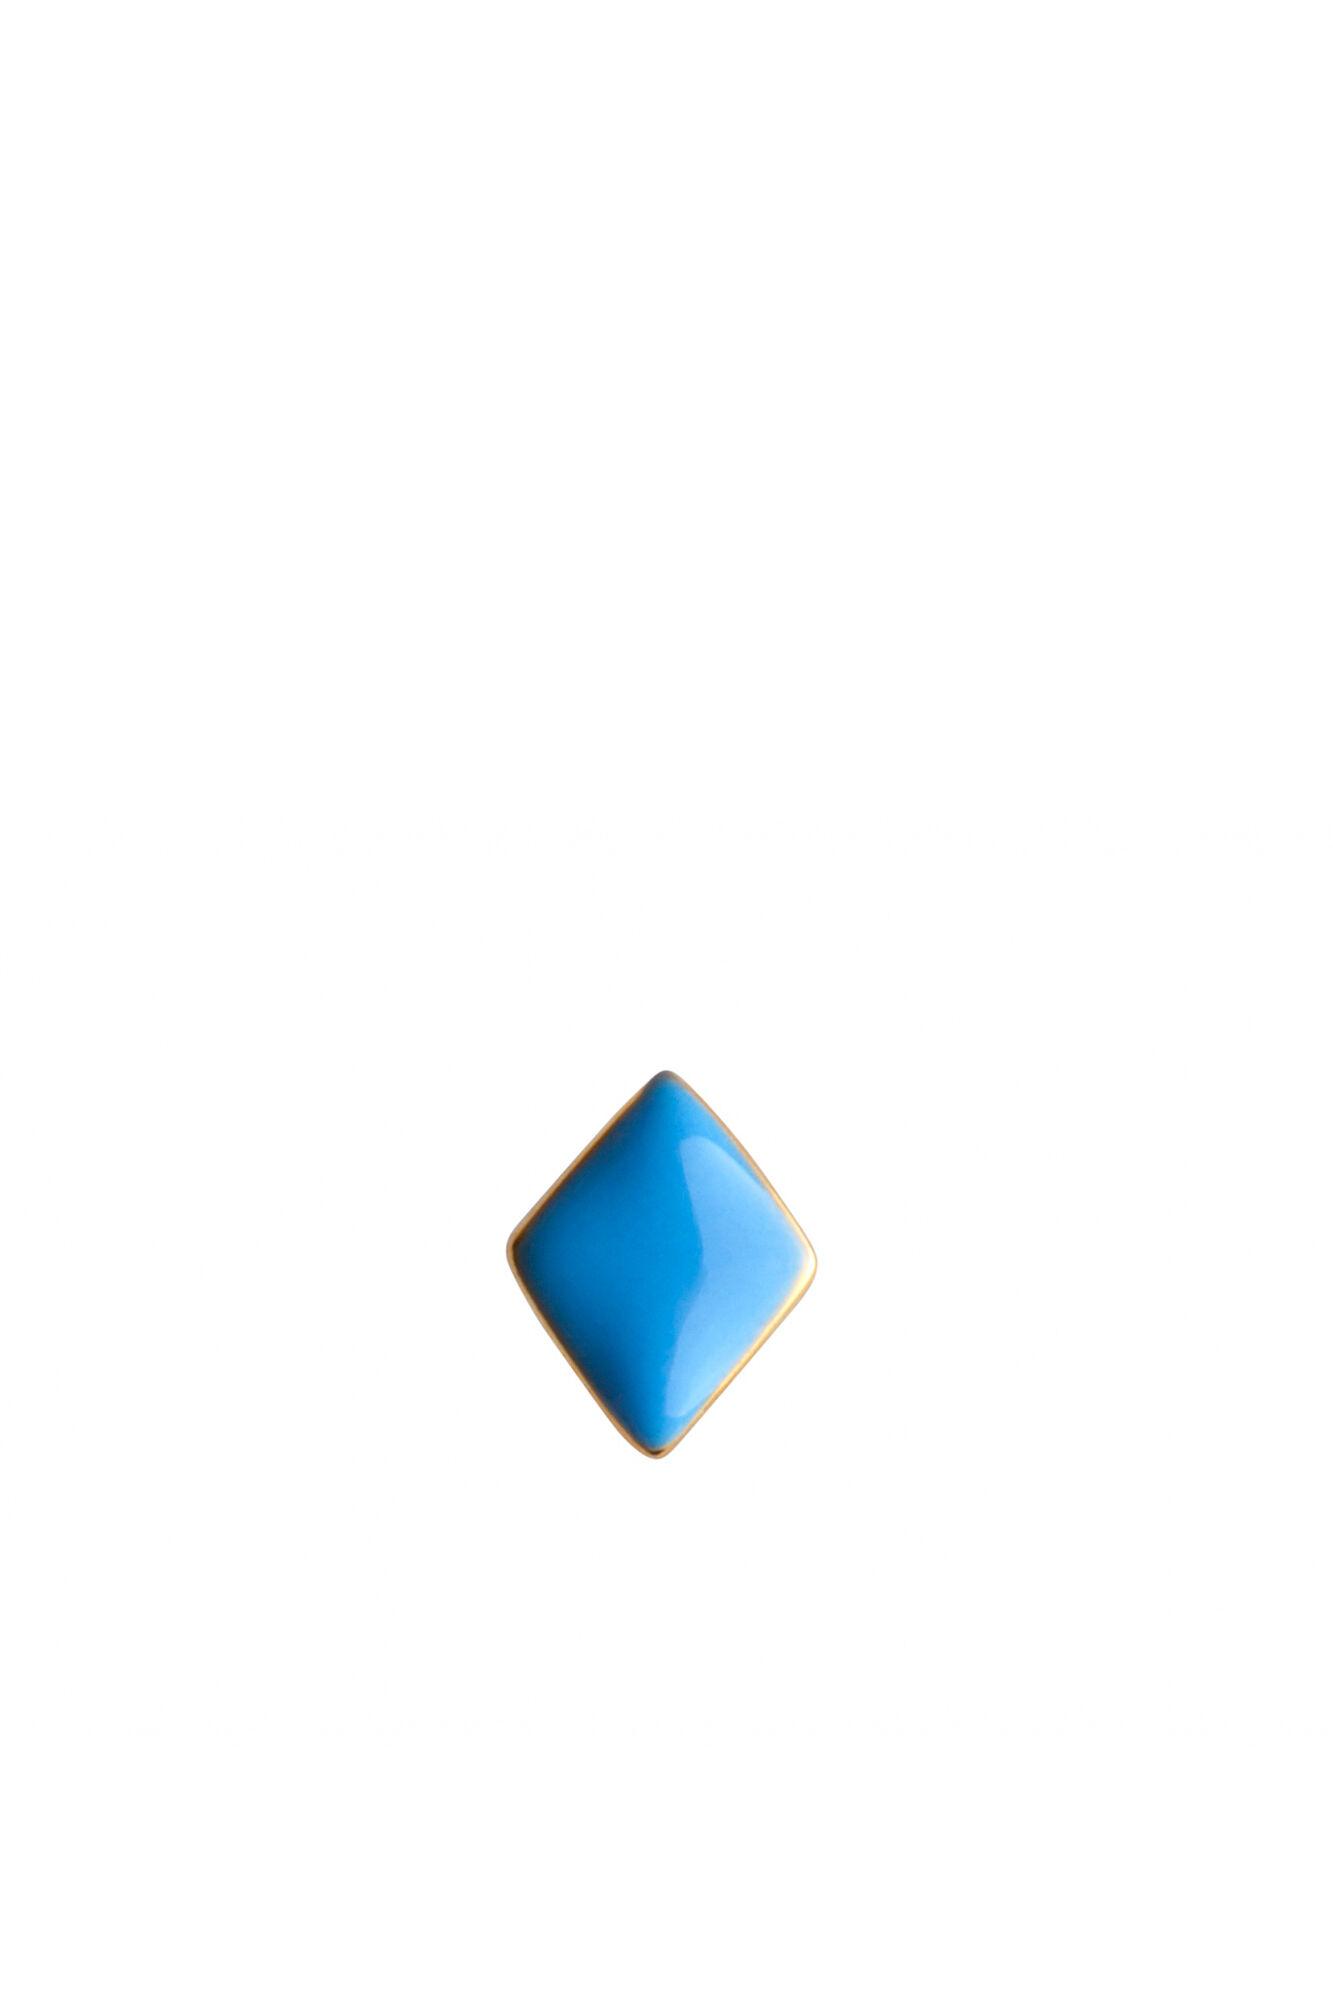 Confetti Creativity LULUE186, BLUE